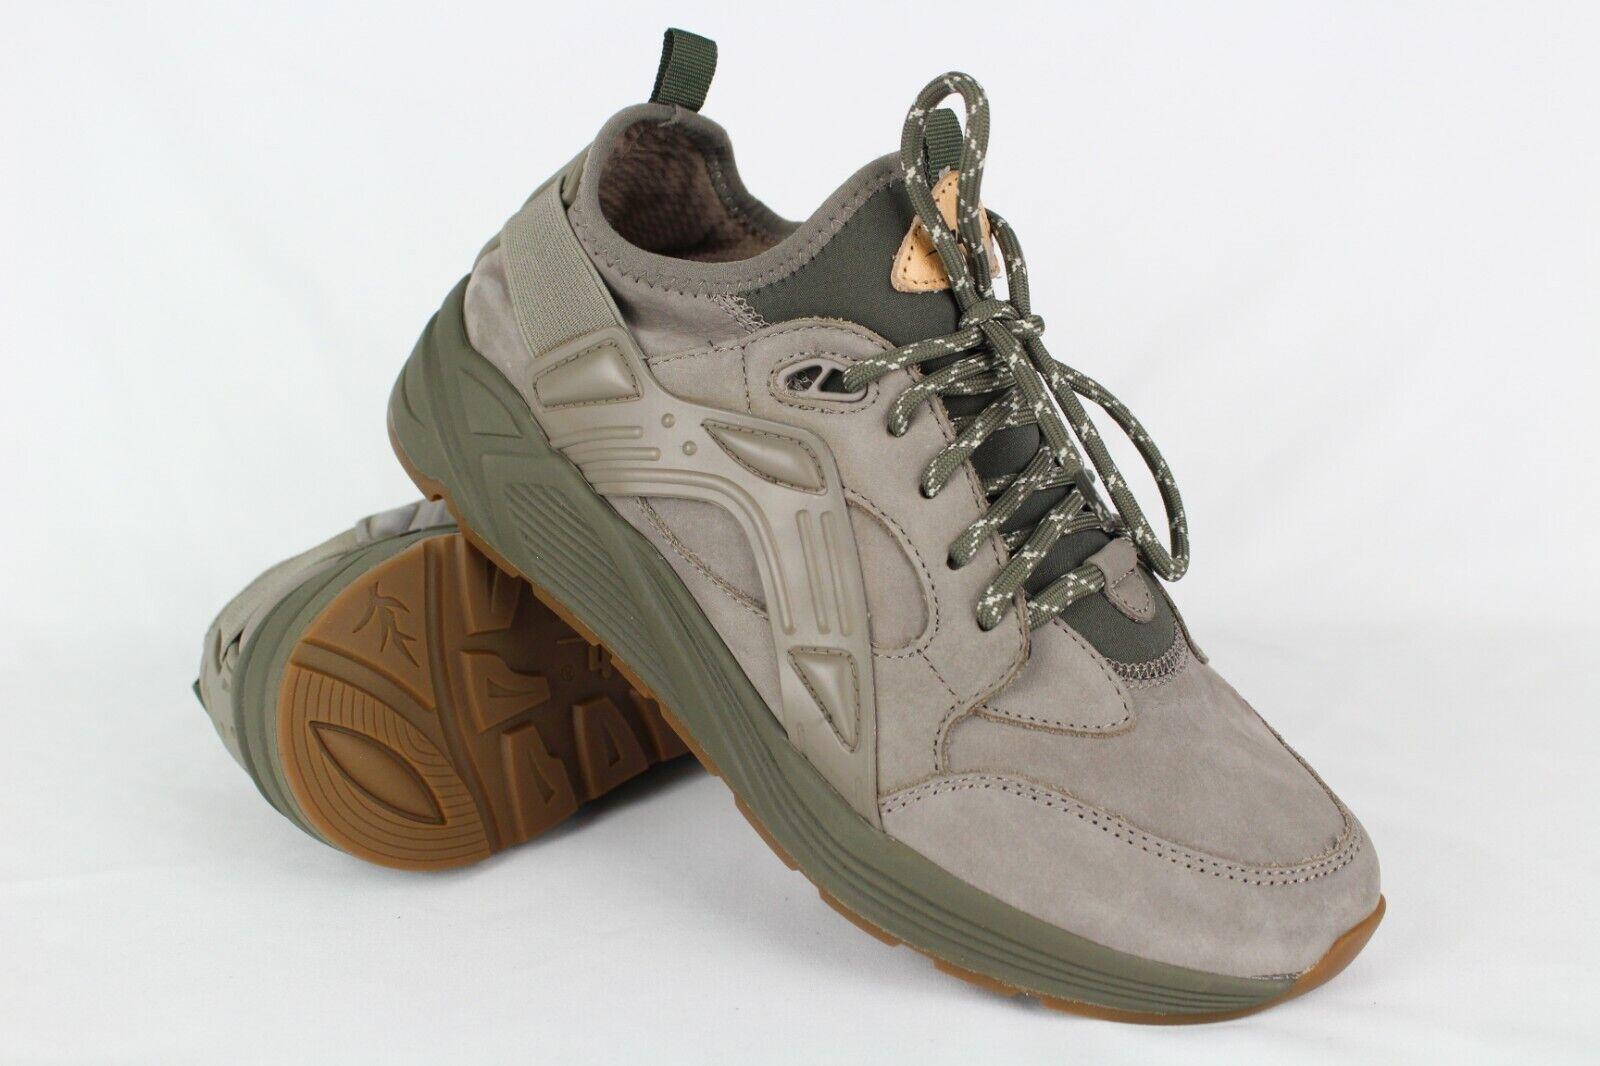 New Earth Women's Saunter Walking Hiking Sneakers Size 10 Grey